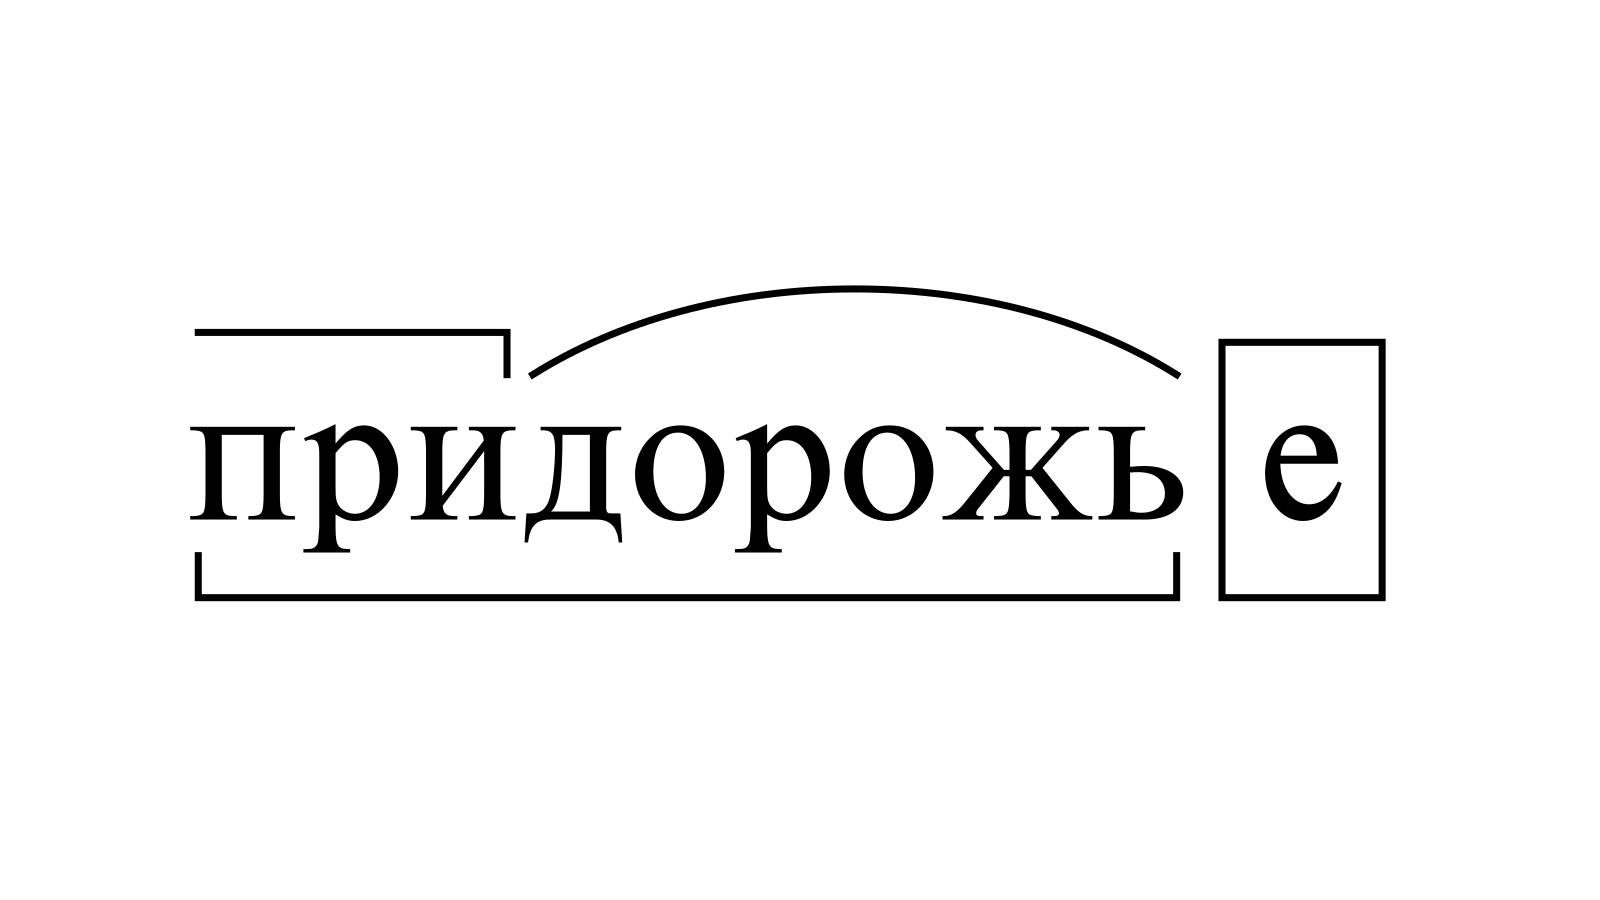 Разбор слова «придорожье» по составу